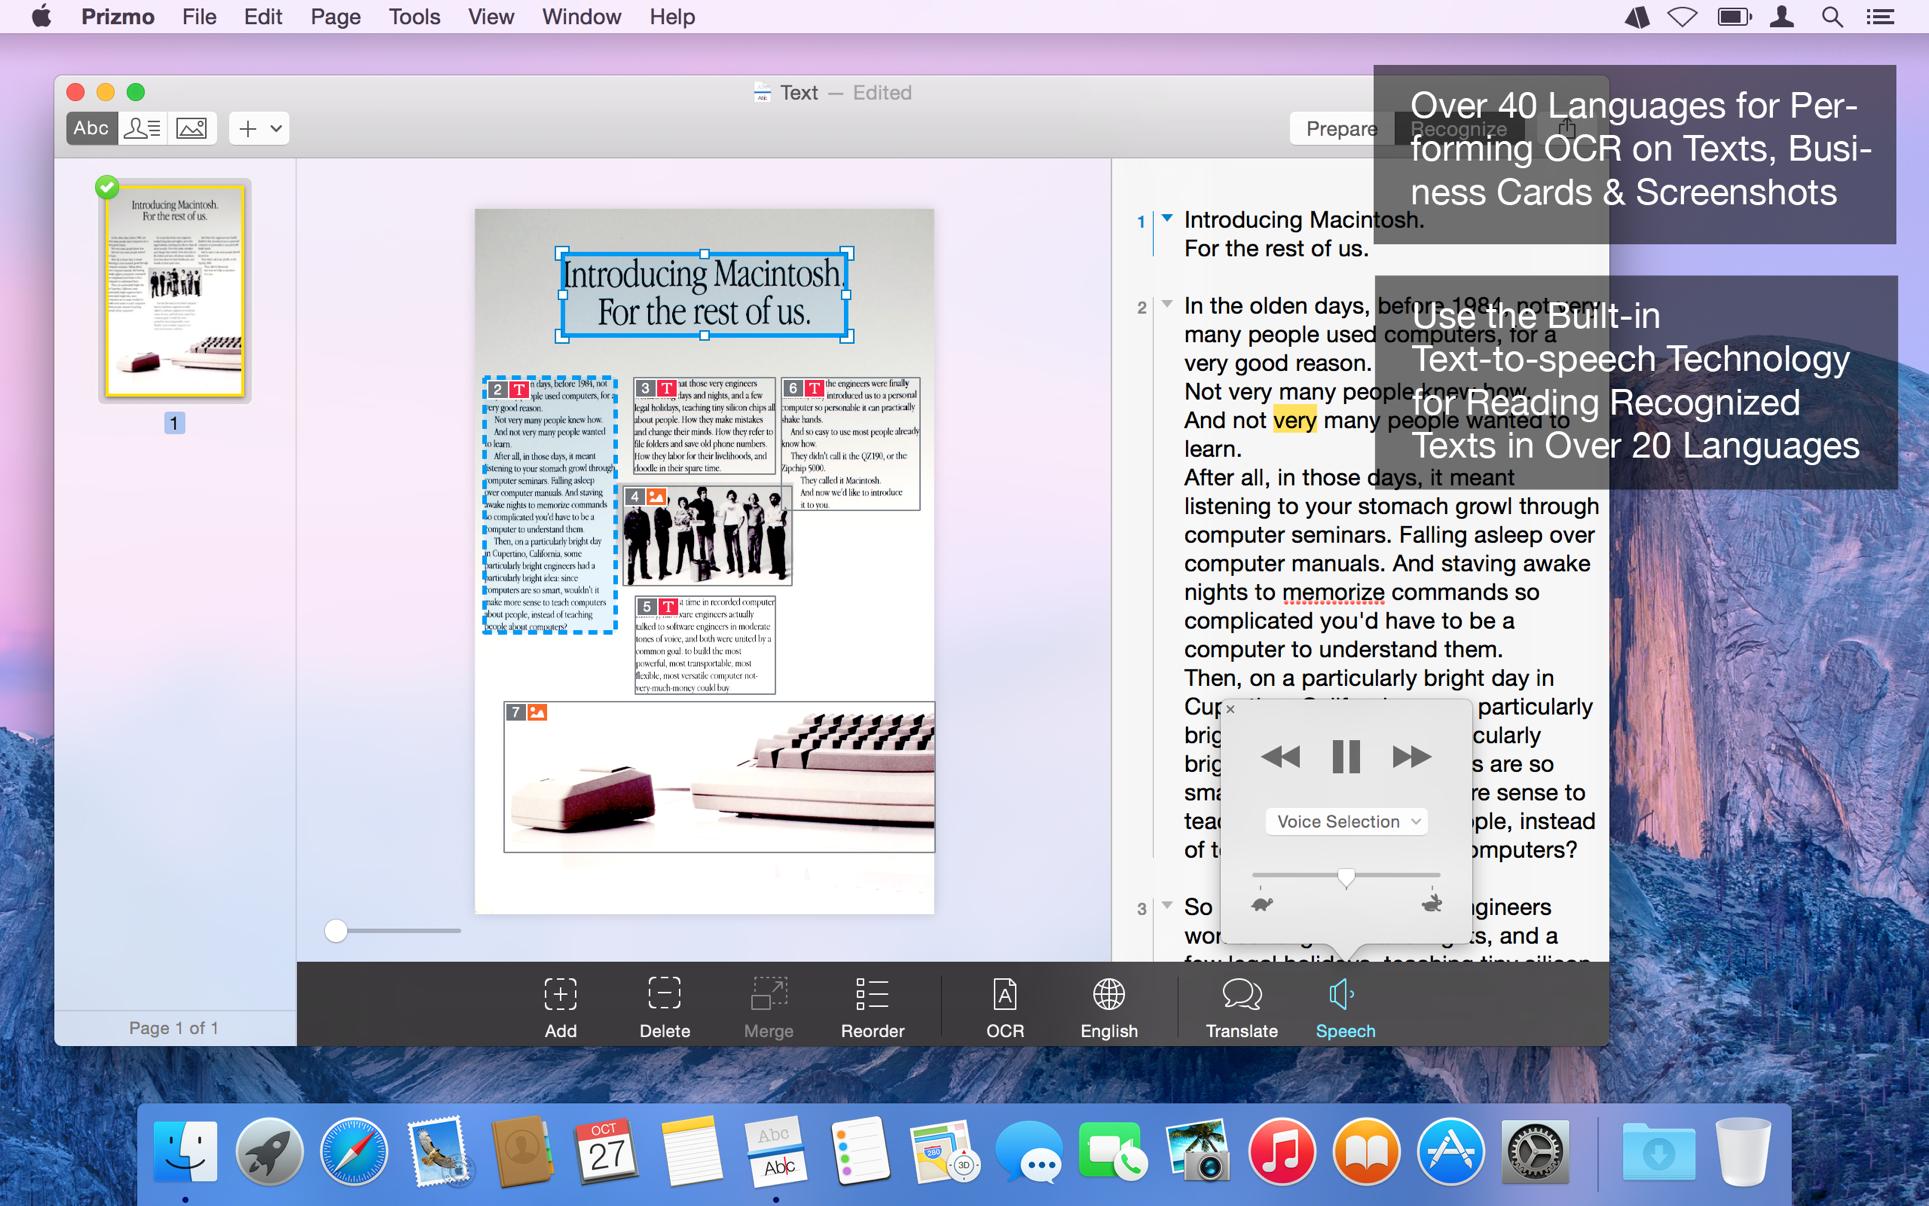 Prizmo Pro 4.0.4 Mac 破解版 光学OCR图像文字识别工具